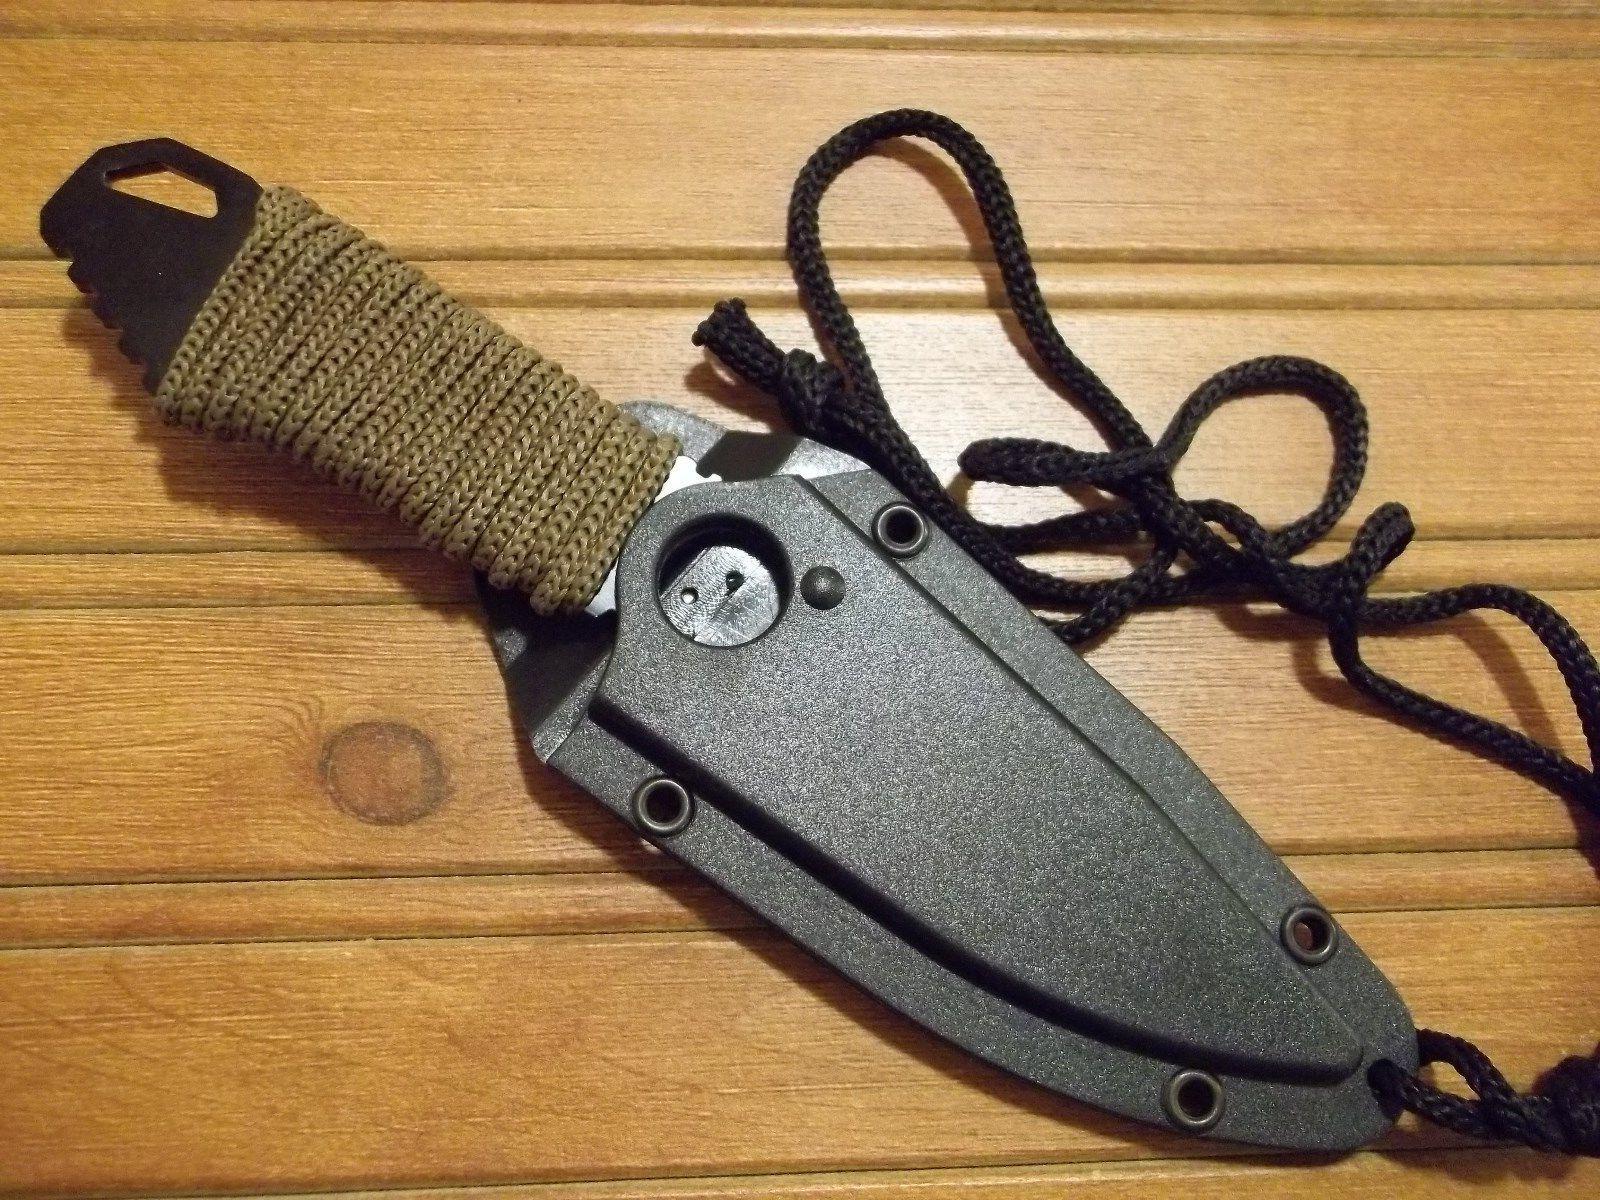 BELT / KNIFE TACTICAL SELF USA MU-1121GN